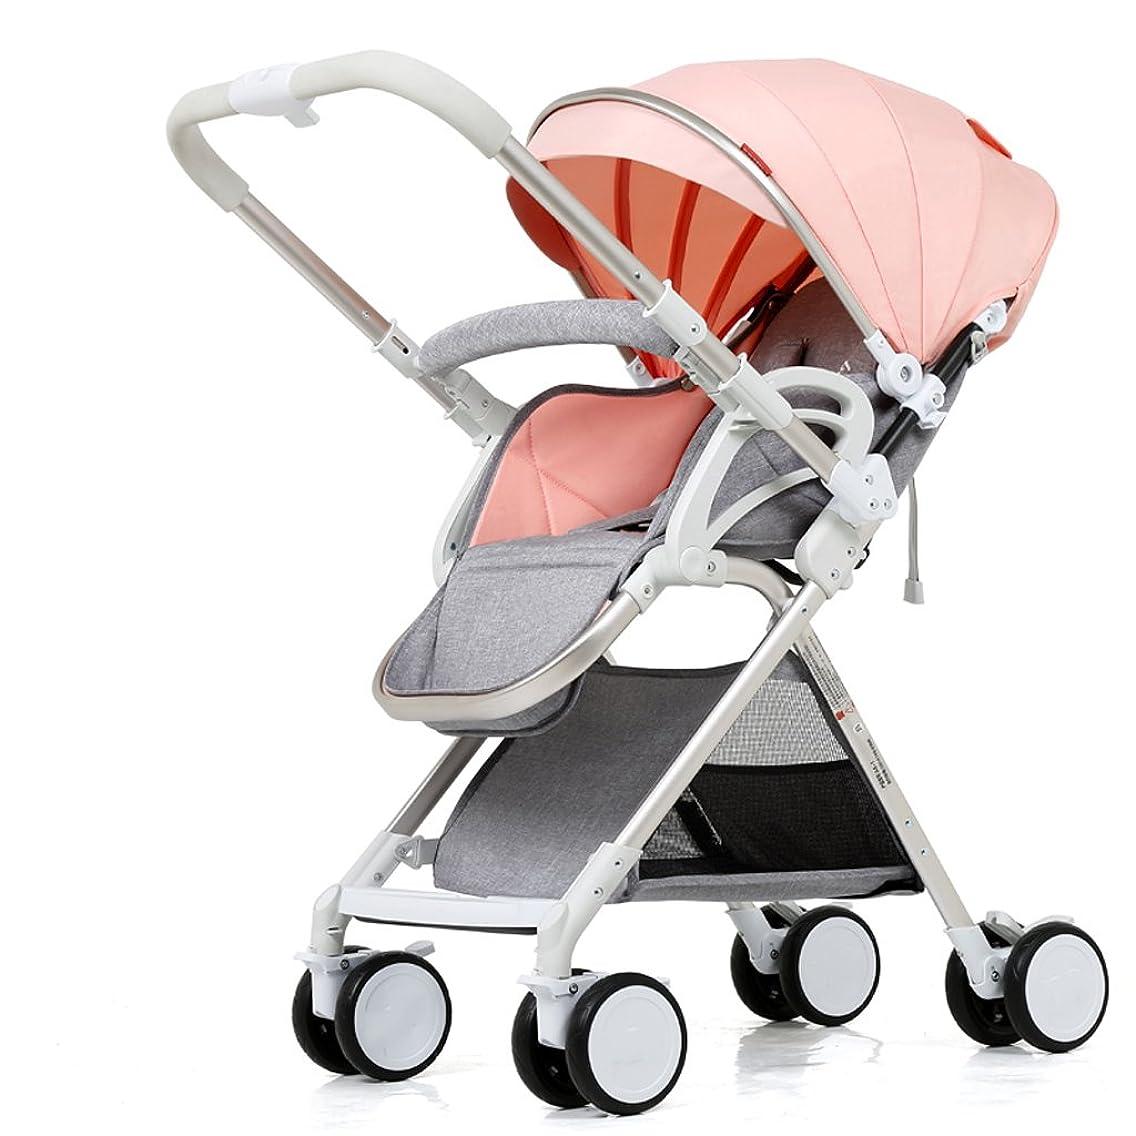 Stroller High Landscape Adjustable Height Aluminum Alloy Children's Umbrella Pushchair Ultra-Light Portable Baby Pushchairs Safety (Color : Pink)